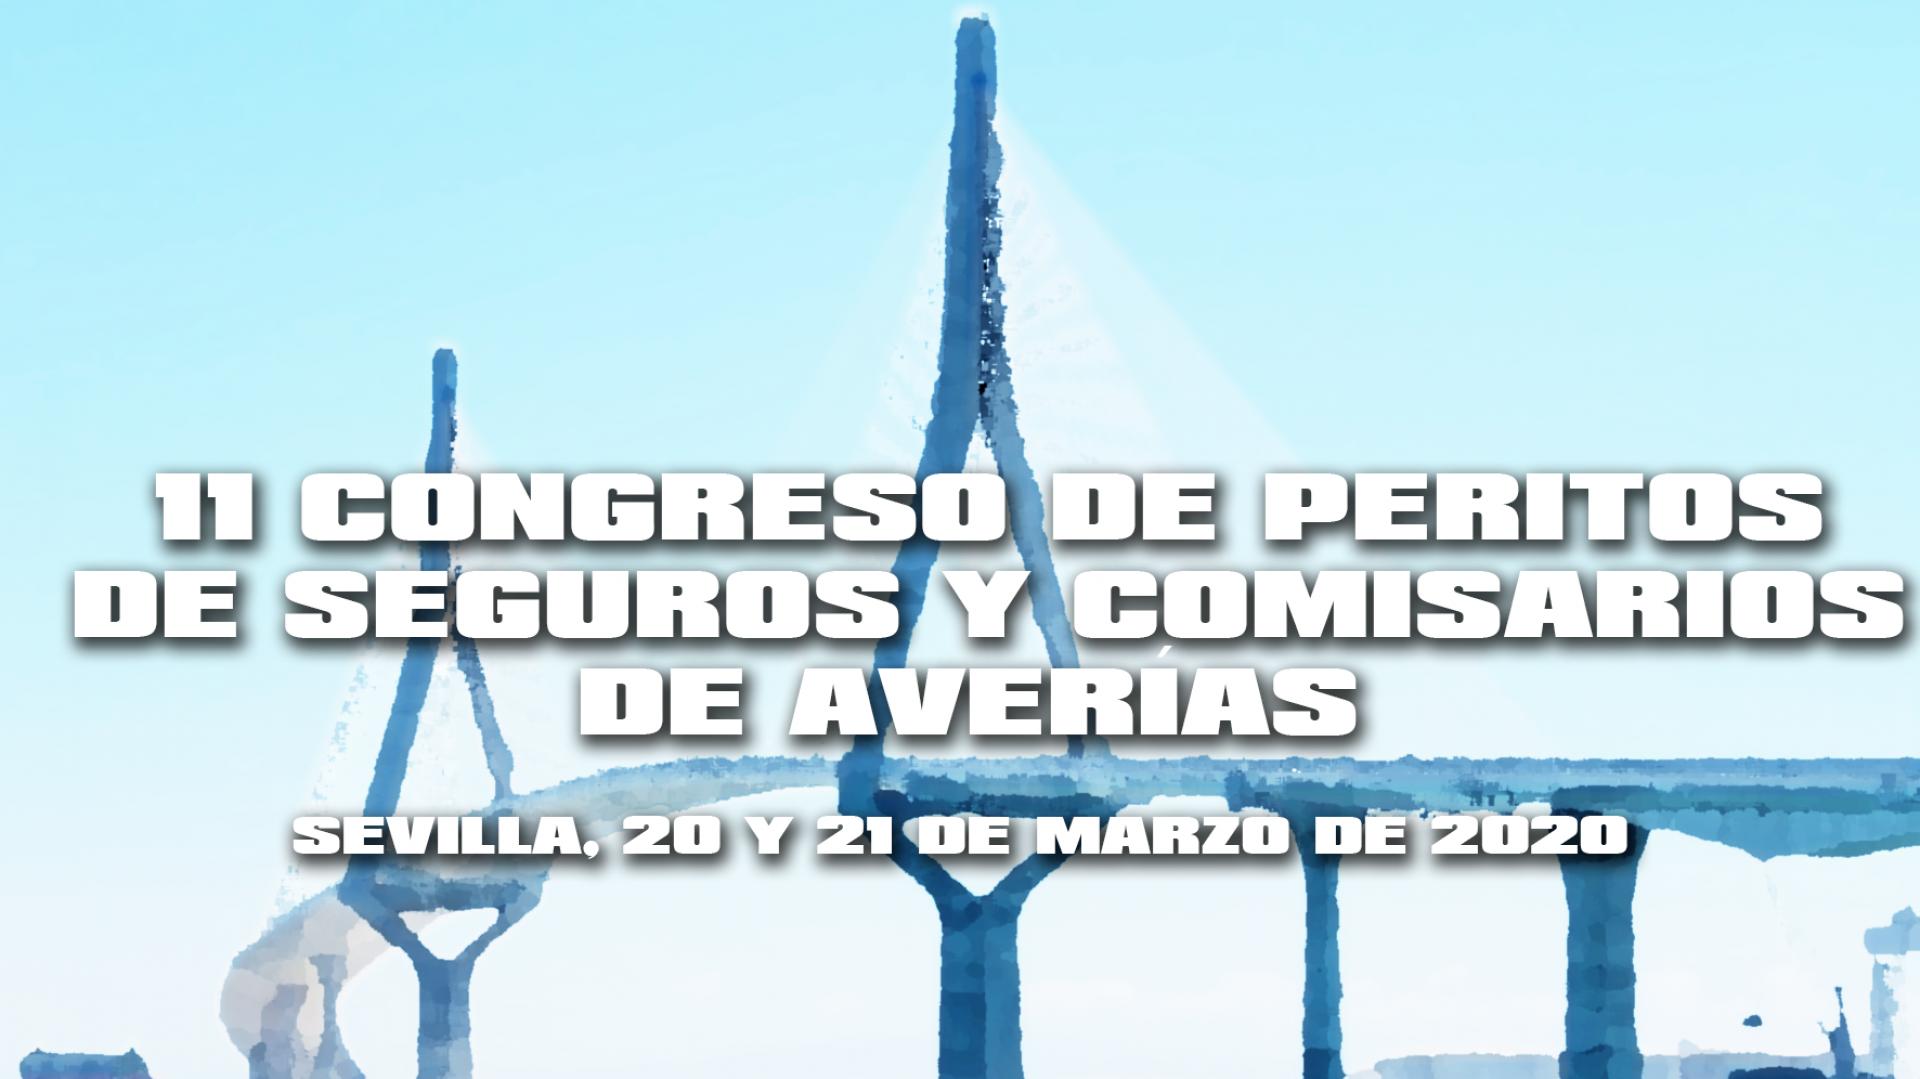 XI Congreso de Peritos de Seguros y Comisarios de Averías